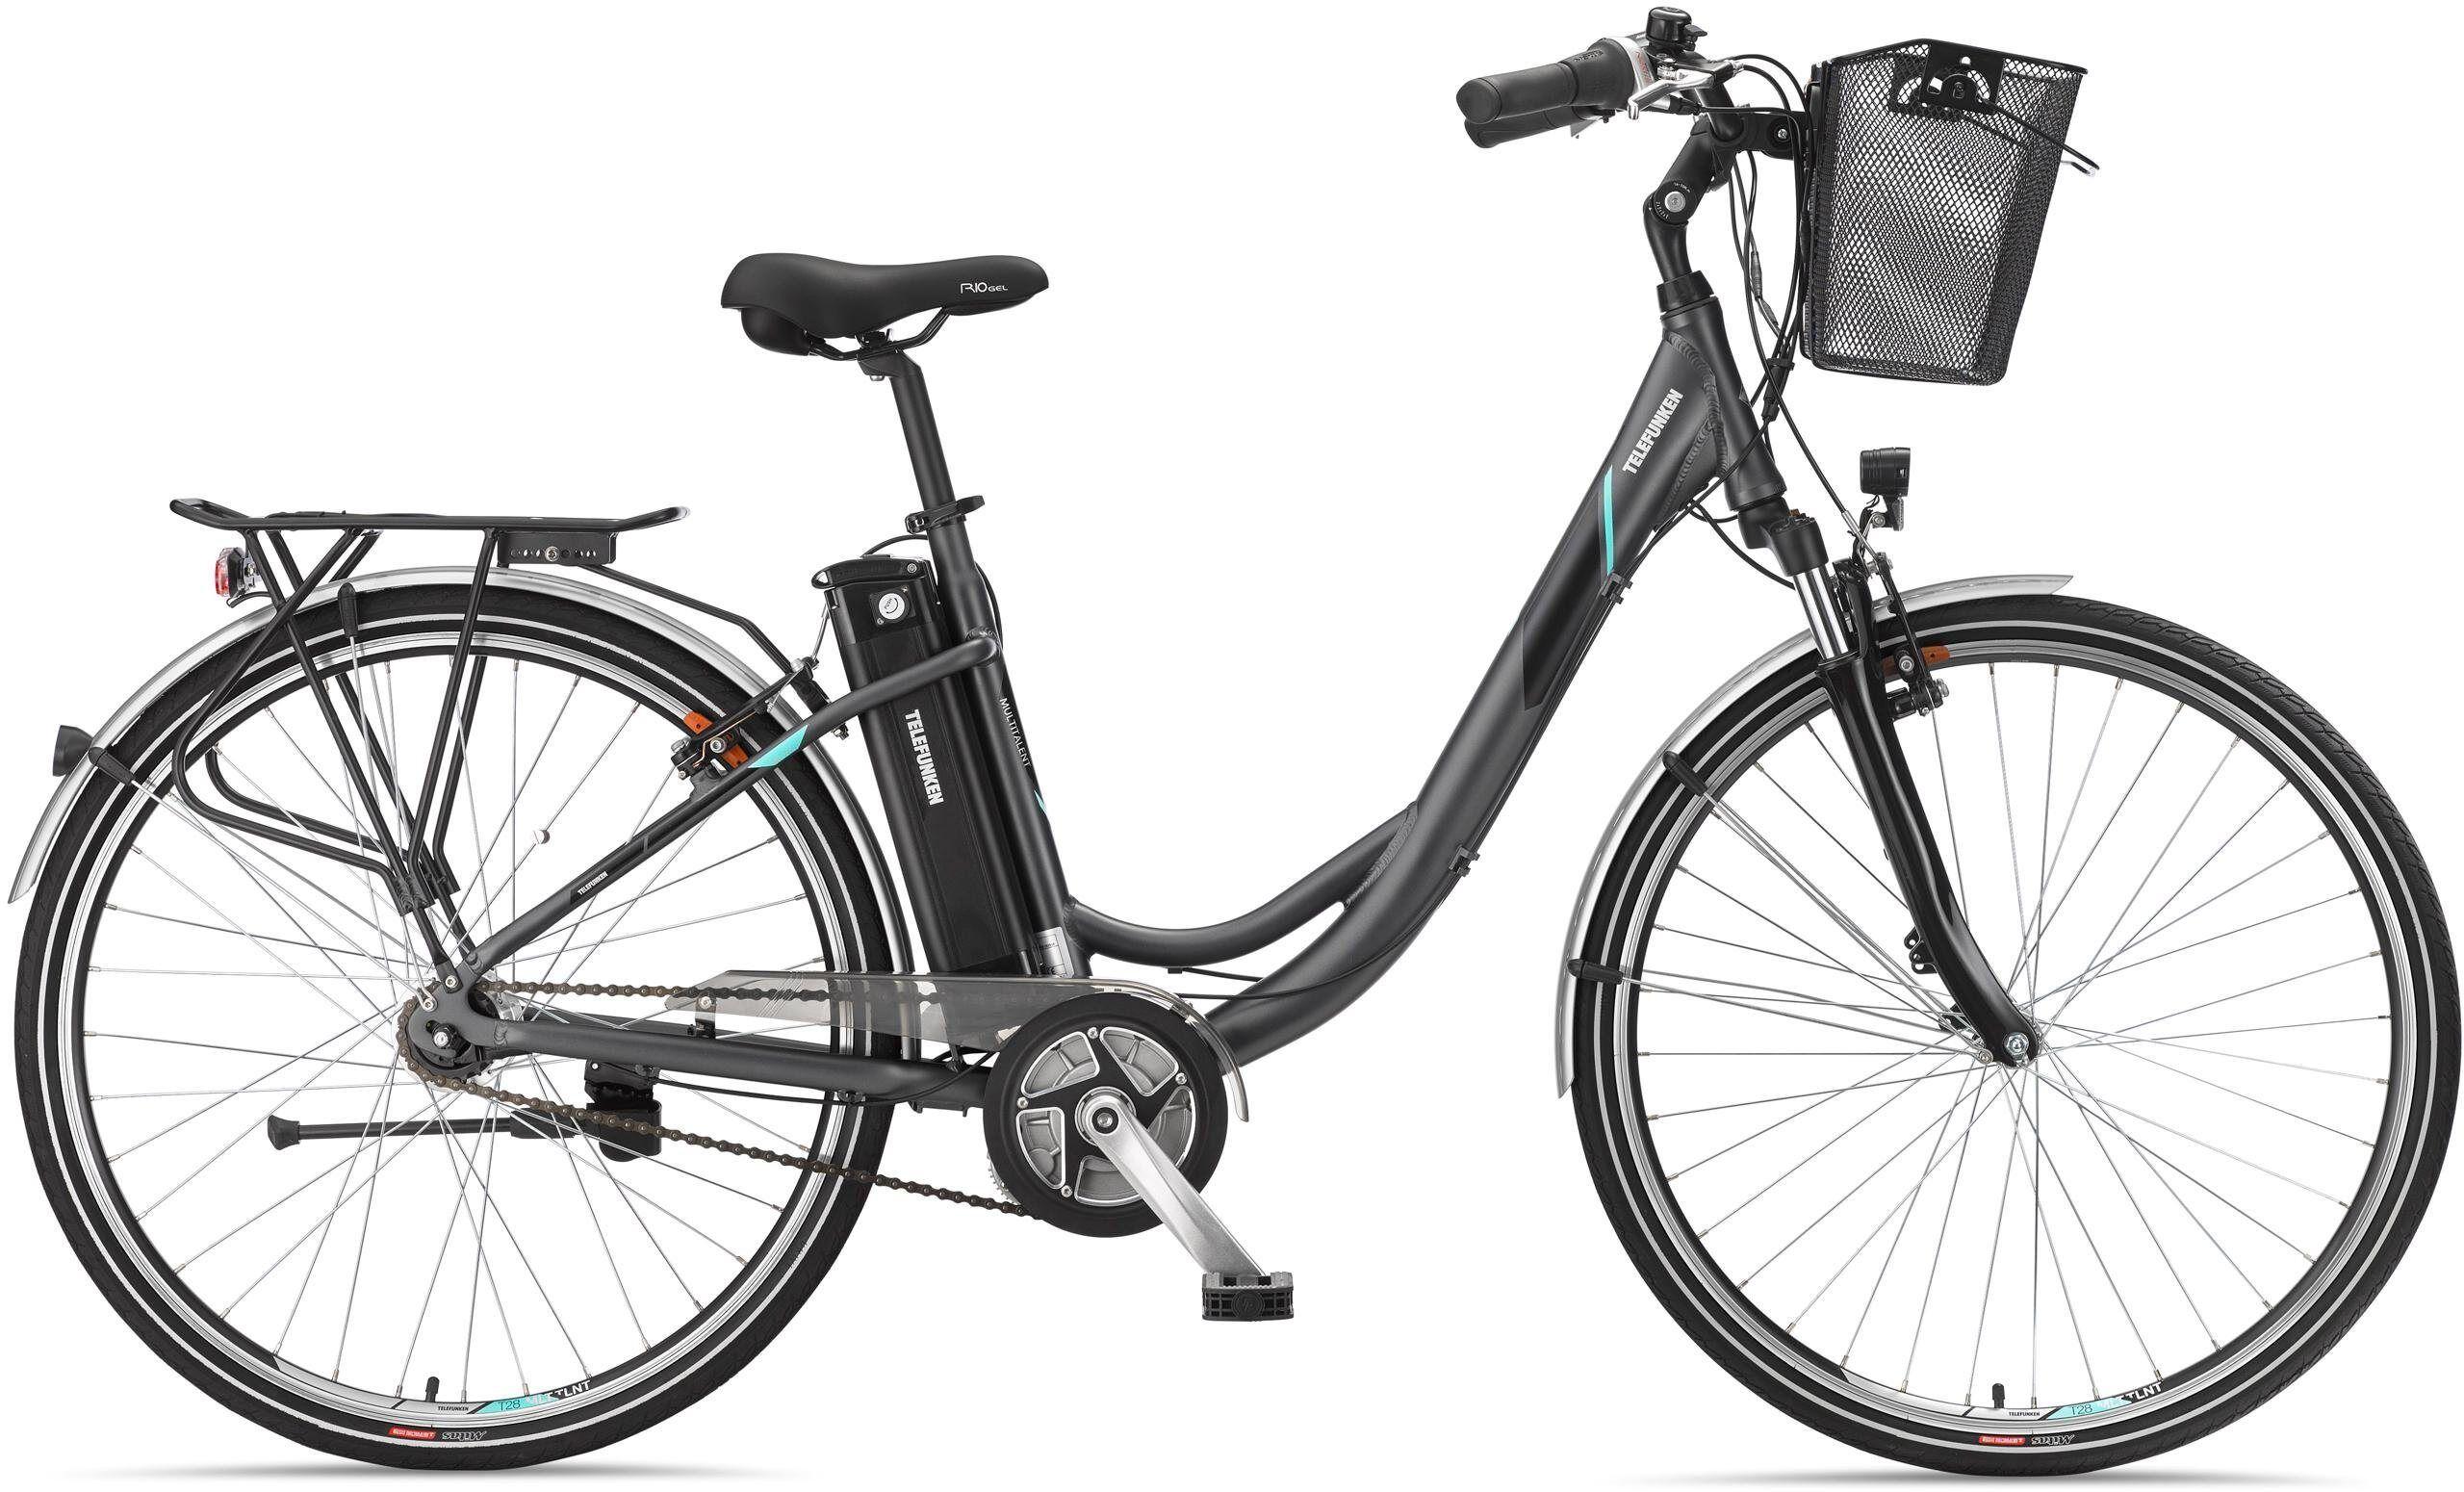 Telefunken E-Bike »RC765 Multitalent«, Shimano Nexus Schaltwerk, Nabenschaltung, Mittelmotor 250 W, anthrazit